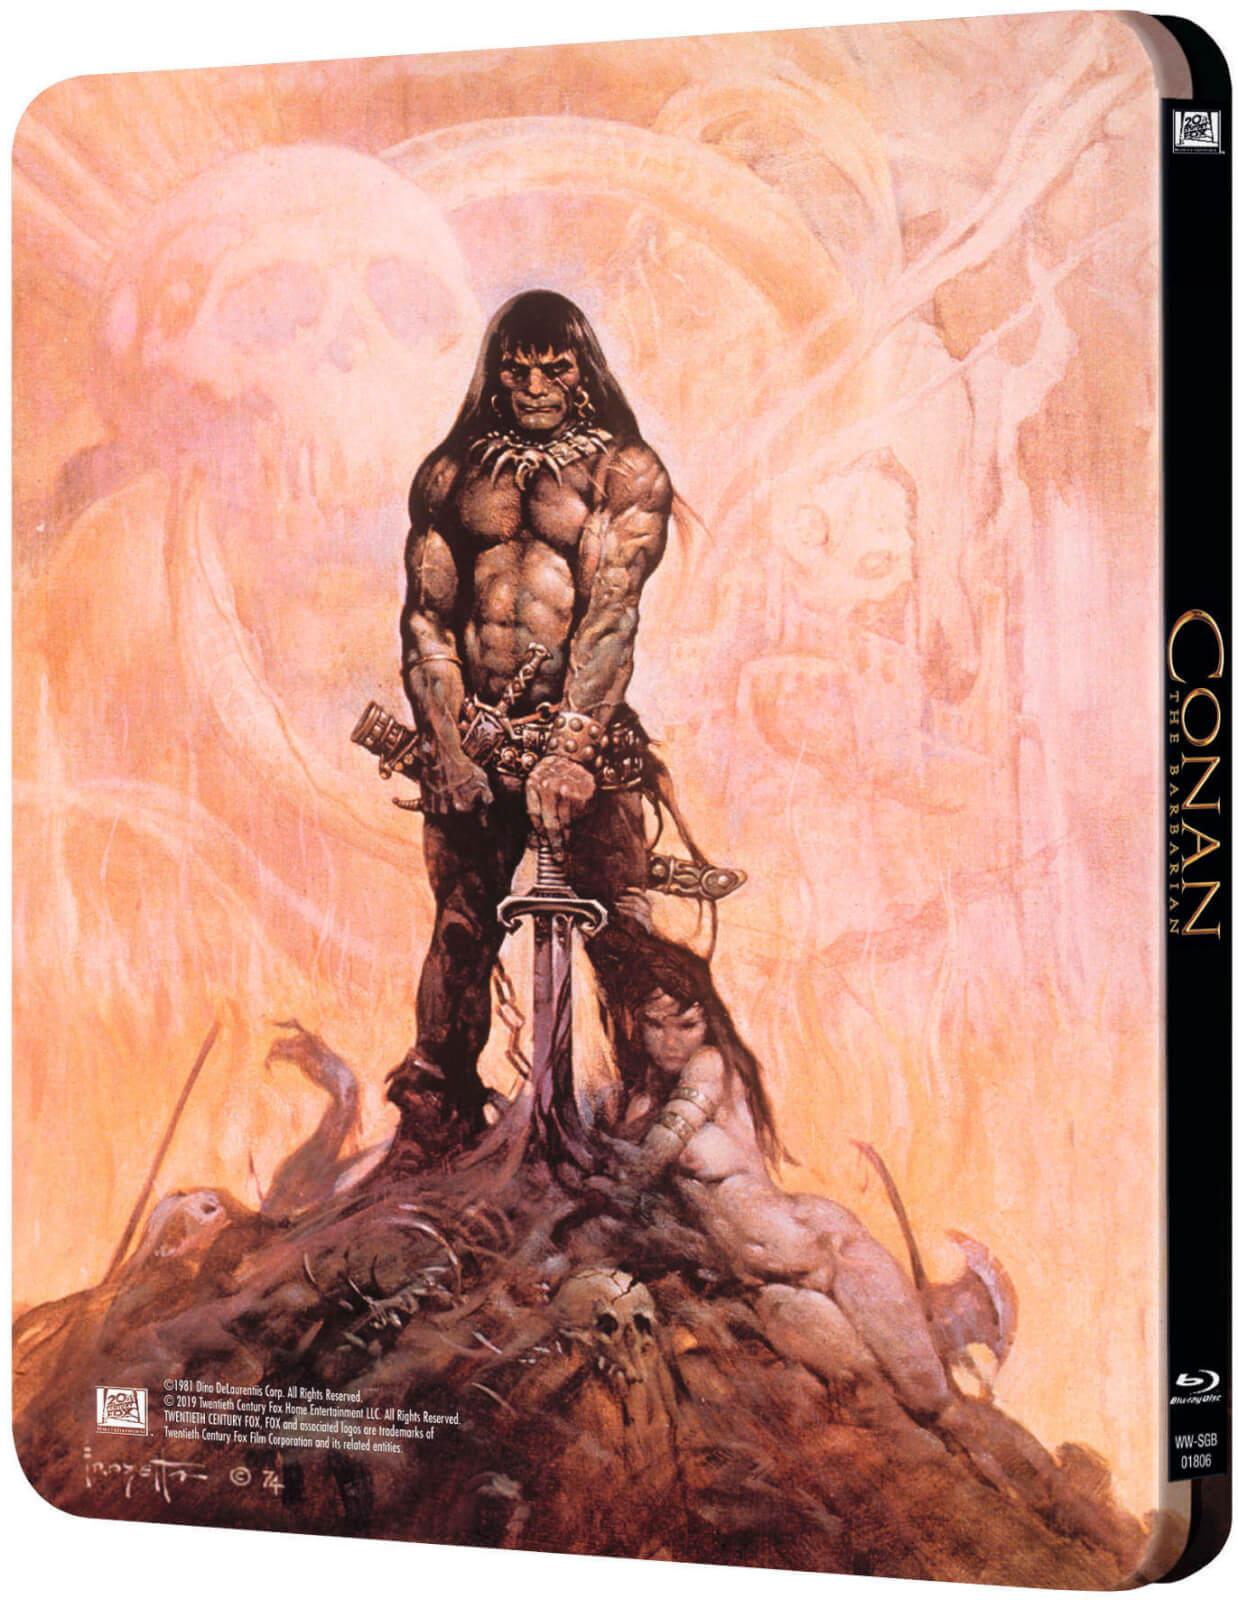 Conan the Barbarian - Zavvi UK Exclusive Steelbook